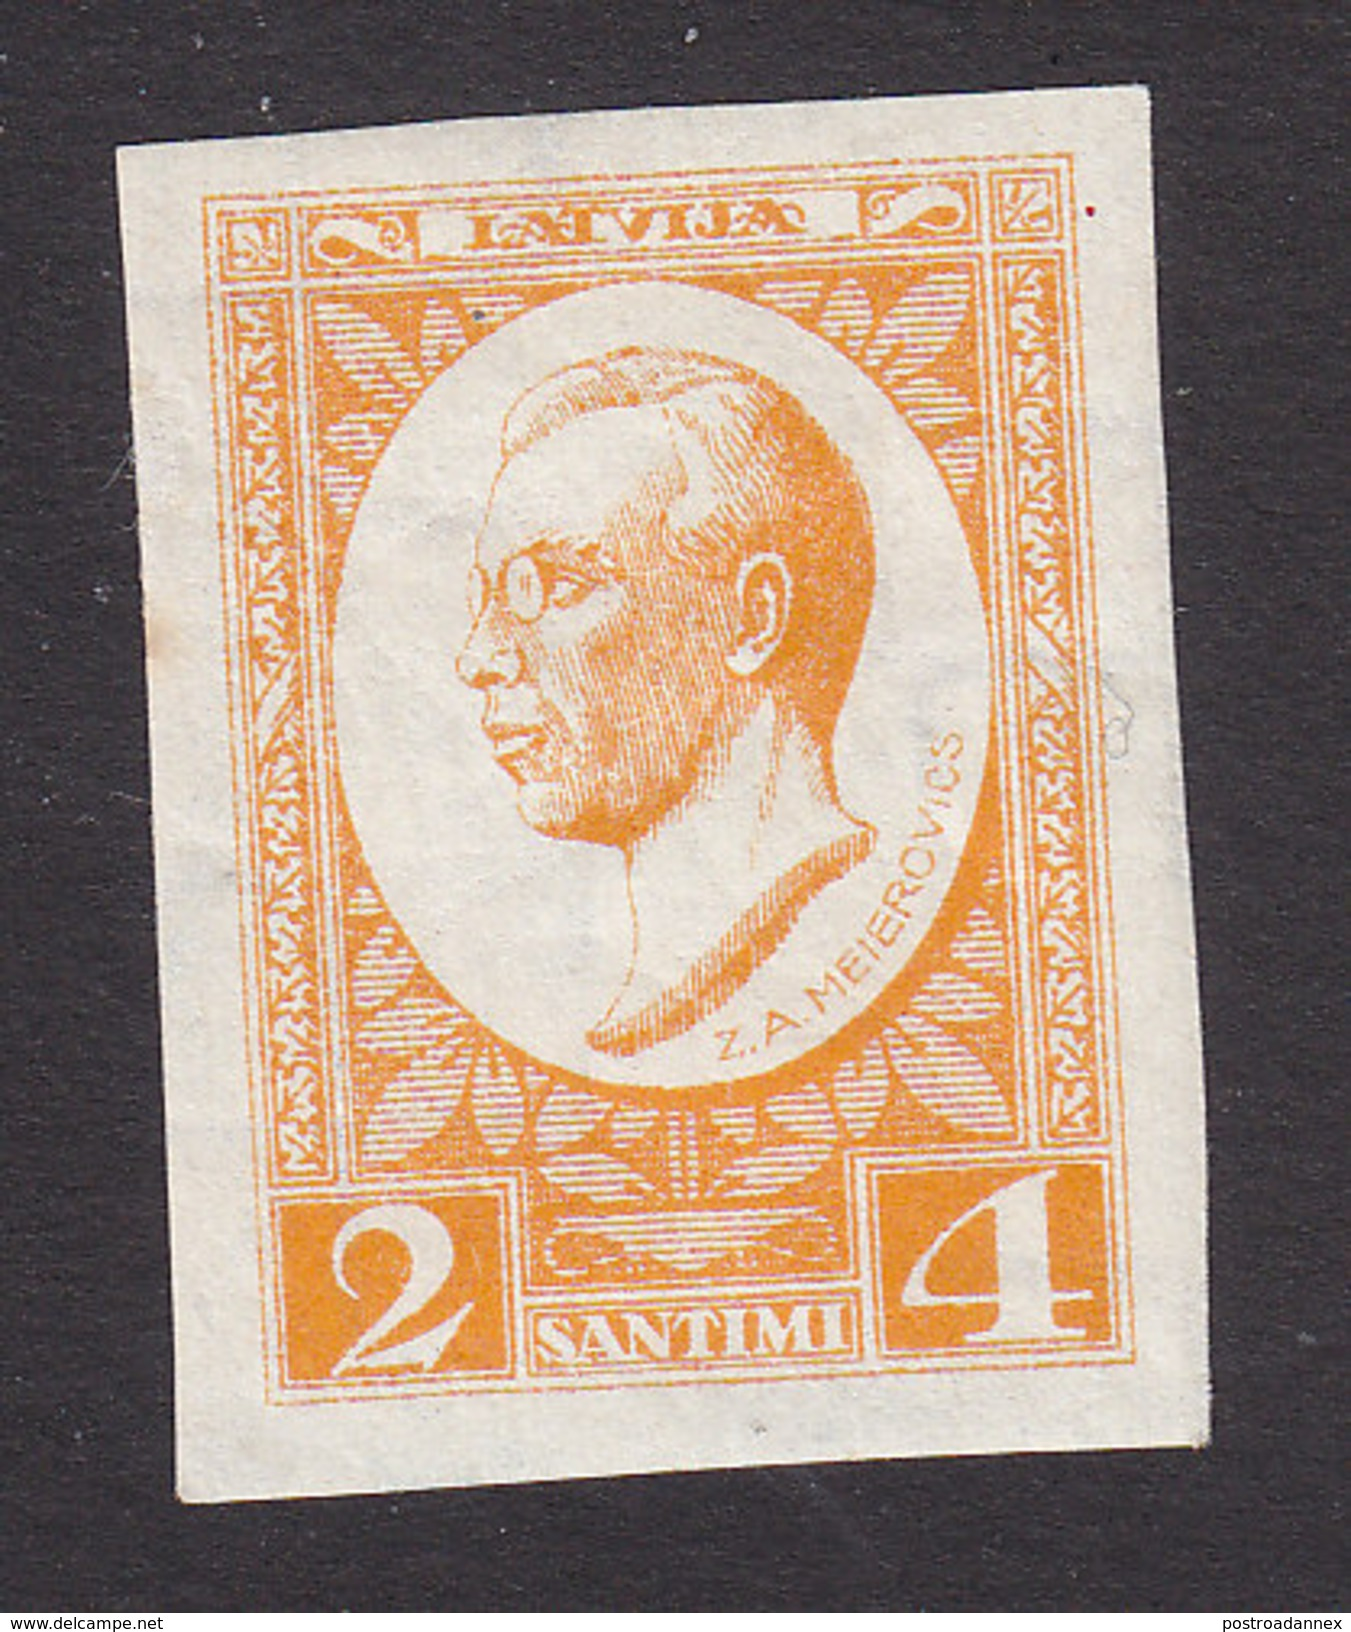 Latvia, Scott #B46, Mint Hinged, Z.A. Meierovics, Issued 1929 - Letland